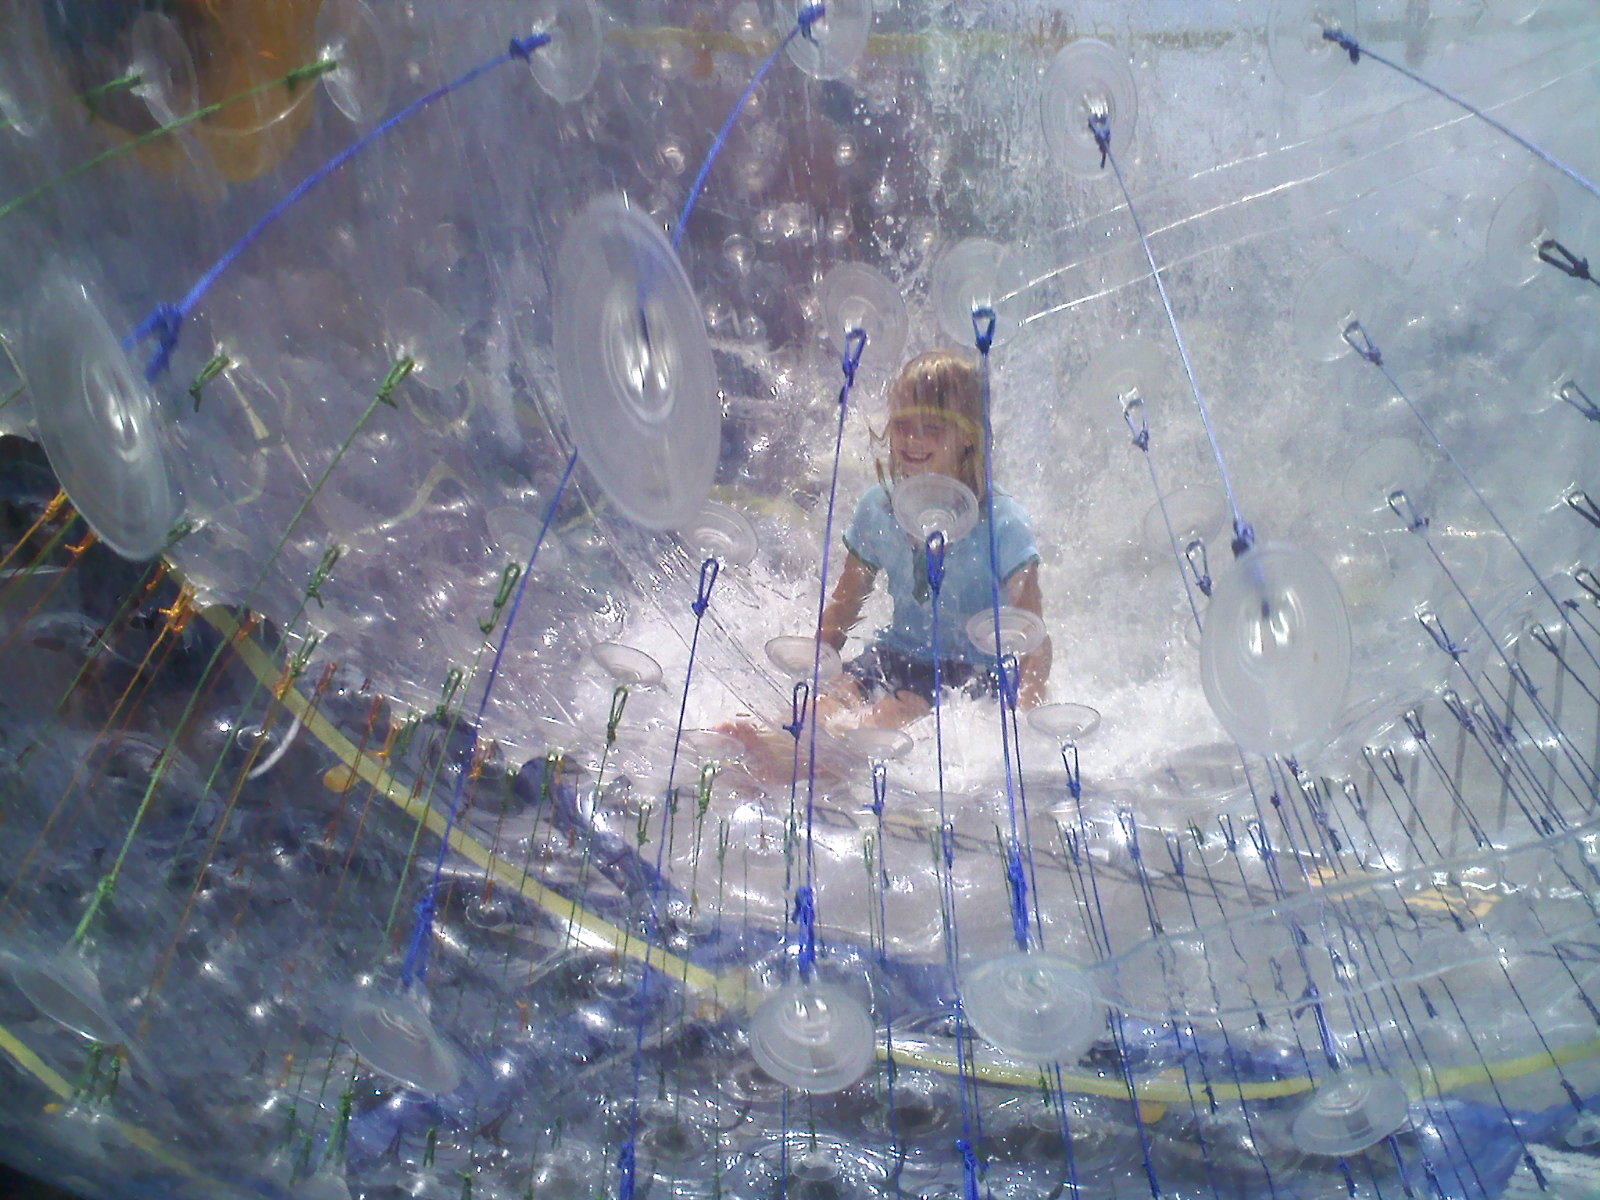 Little Kid on the Fishpipe